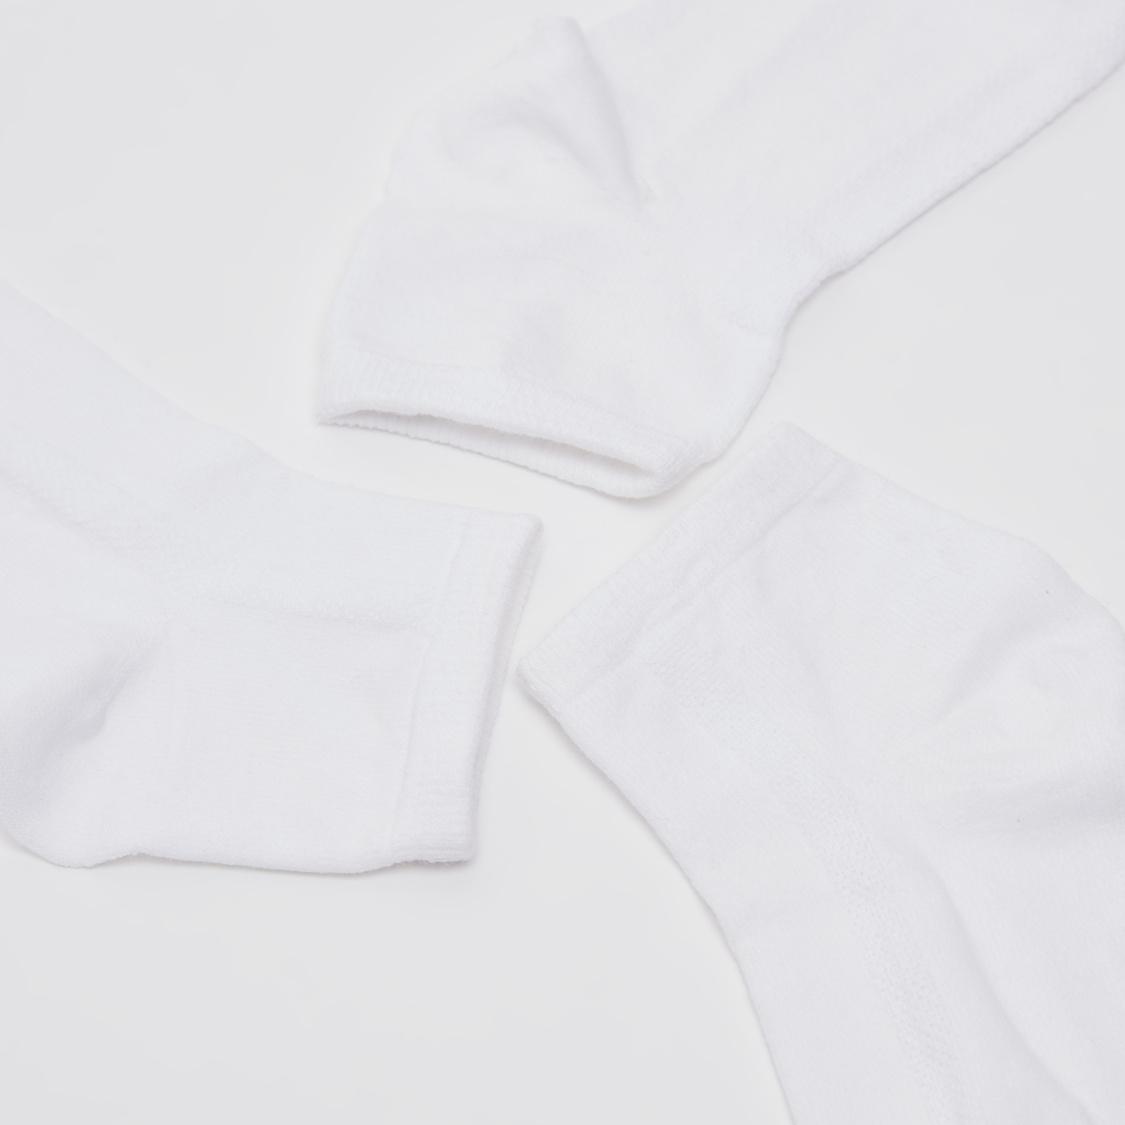 Set of 3 - Textured Ankle Length Socks